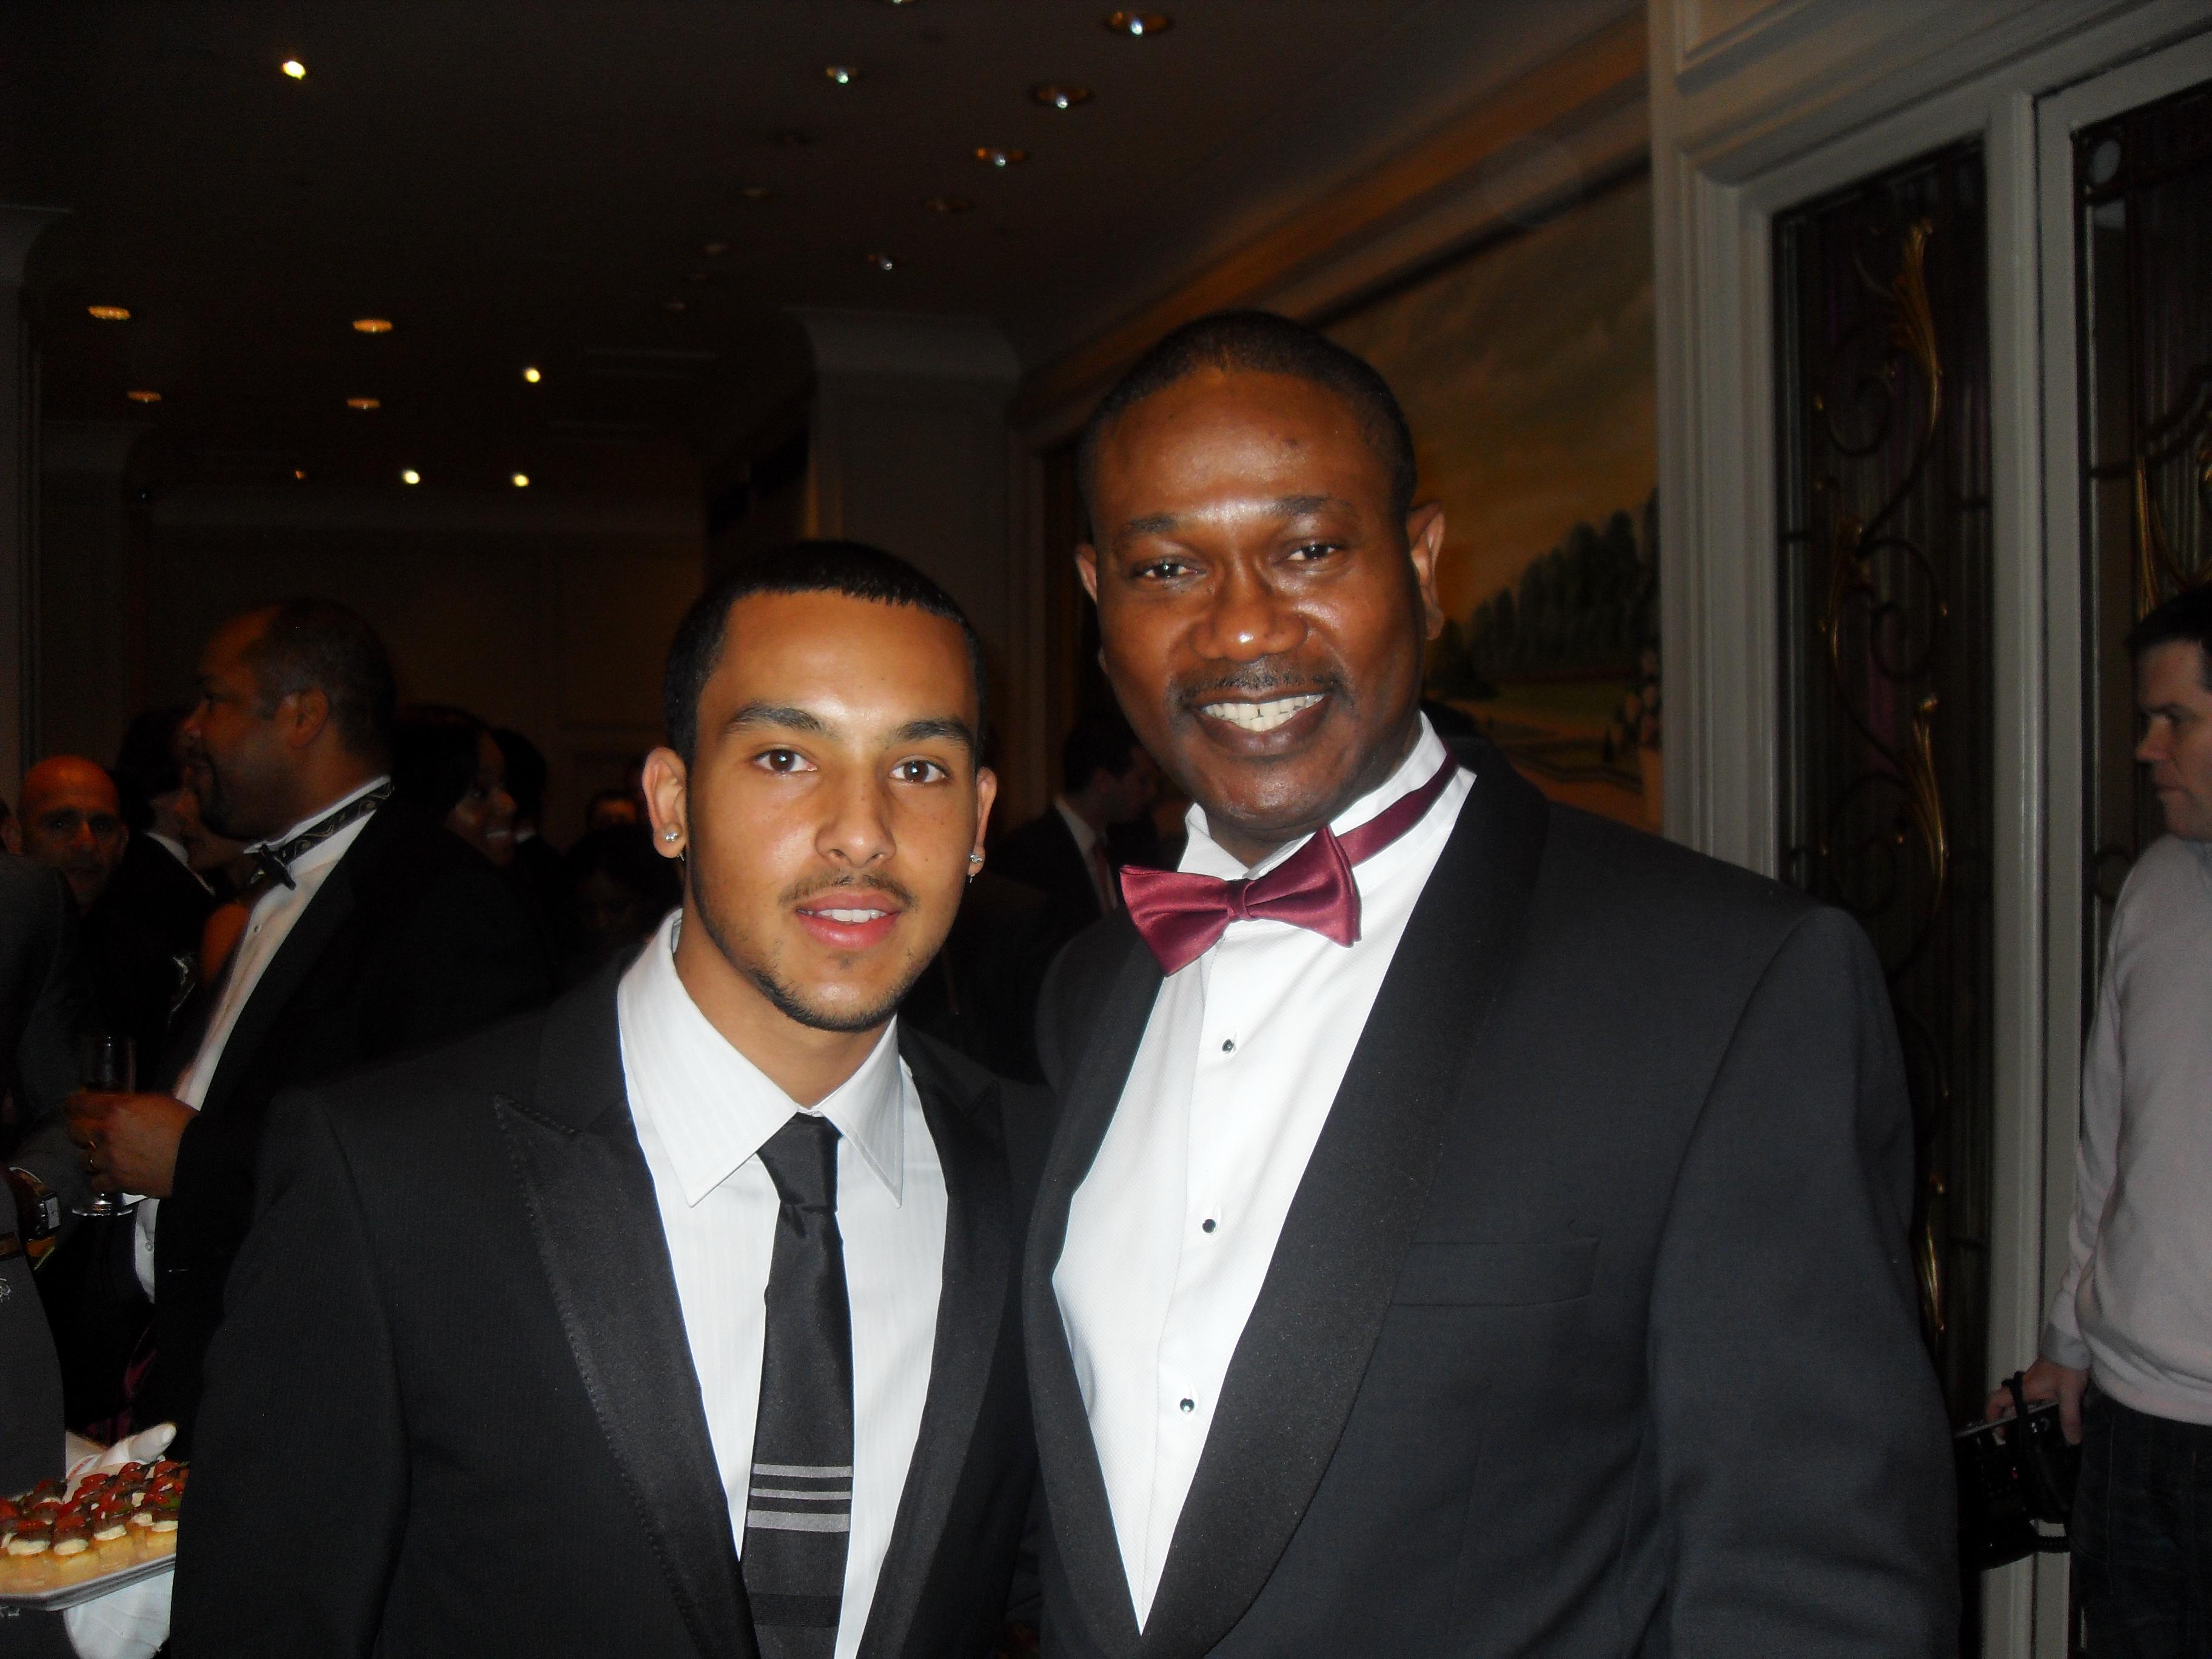 Dr. Oke with footballer Theo Walcott